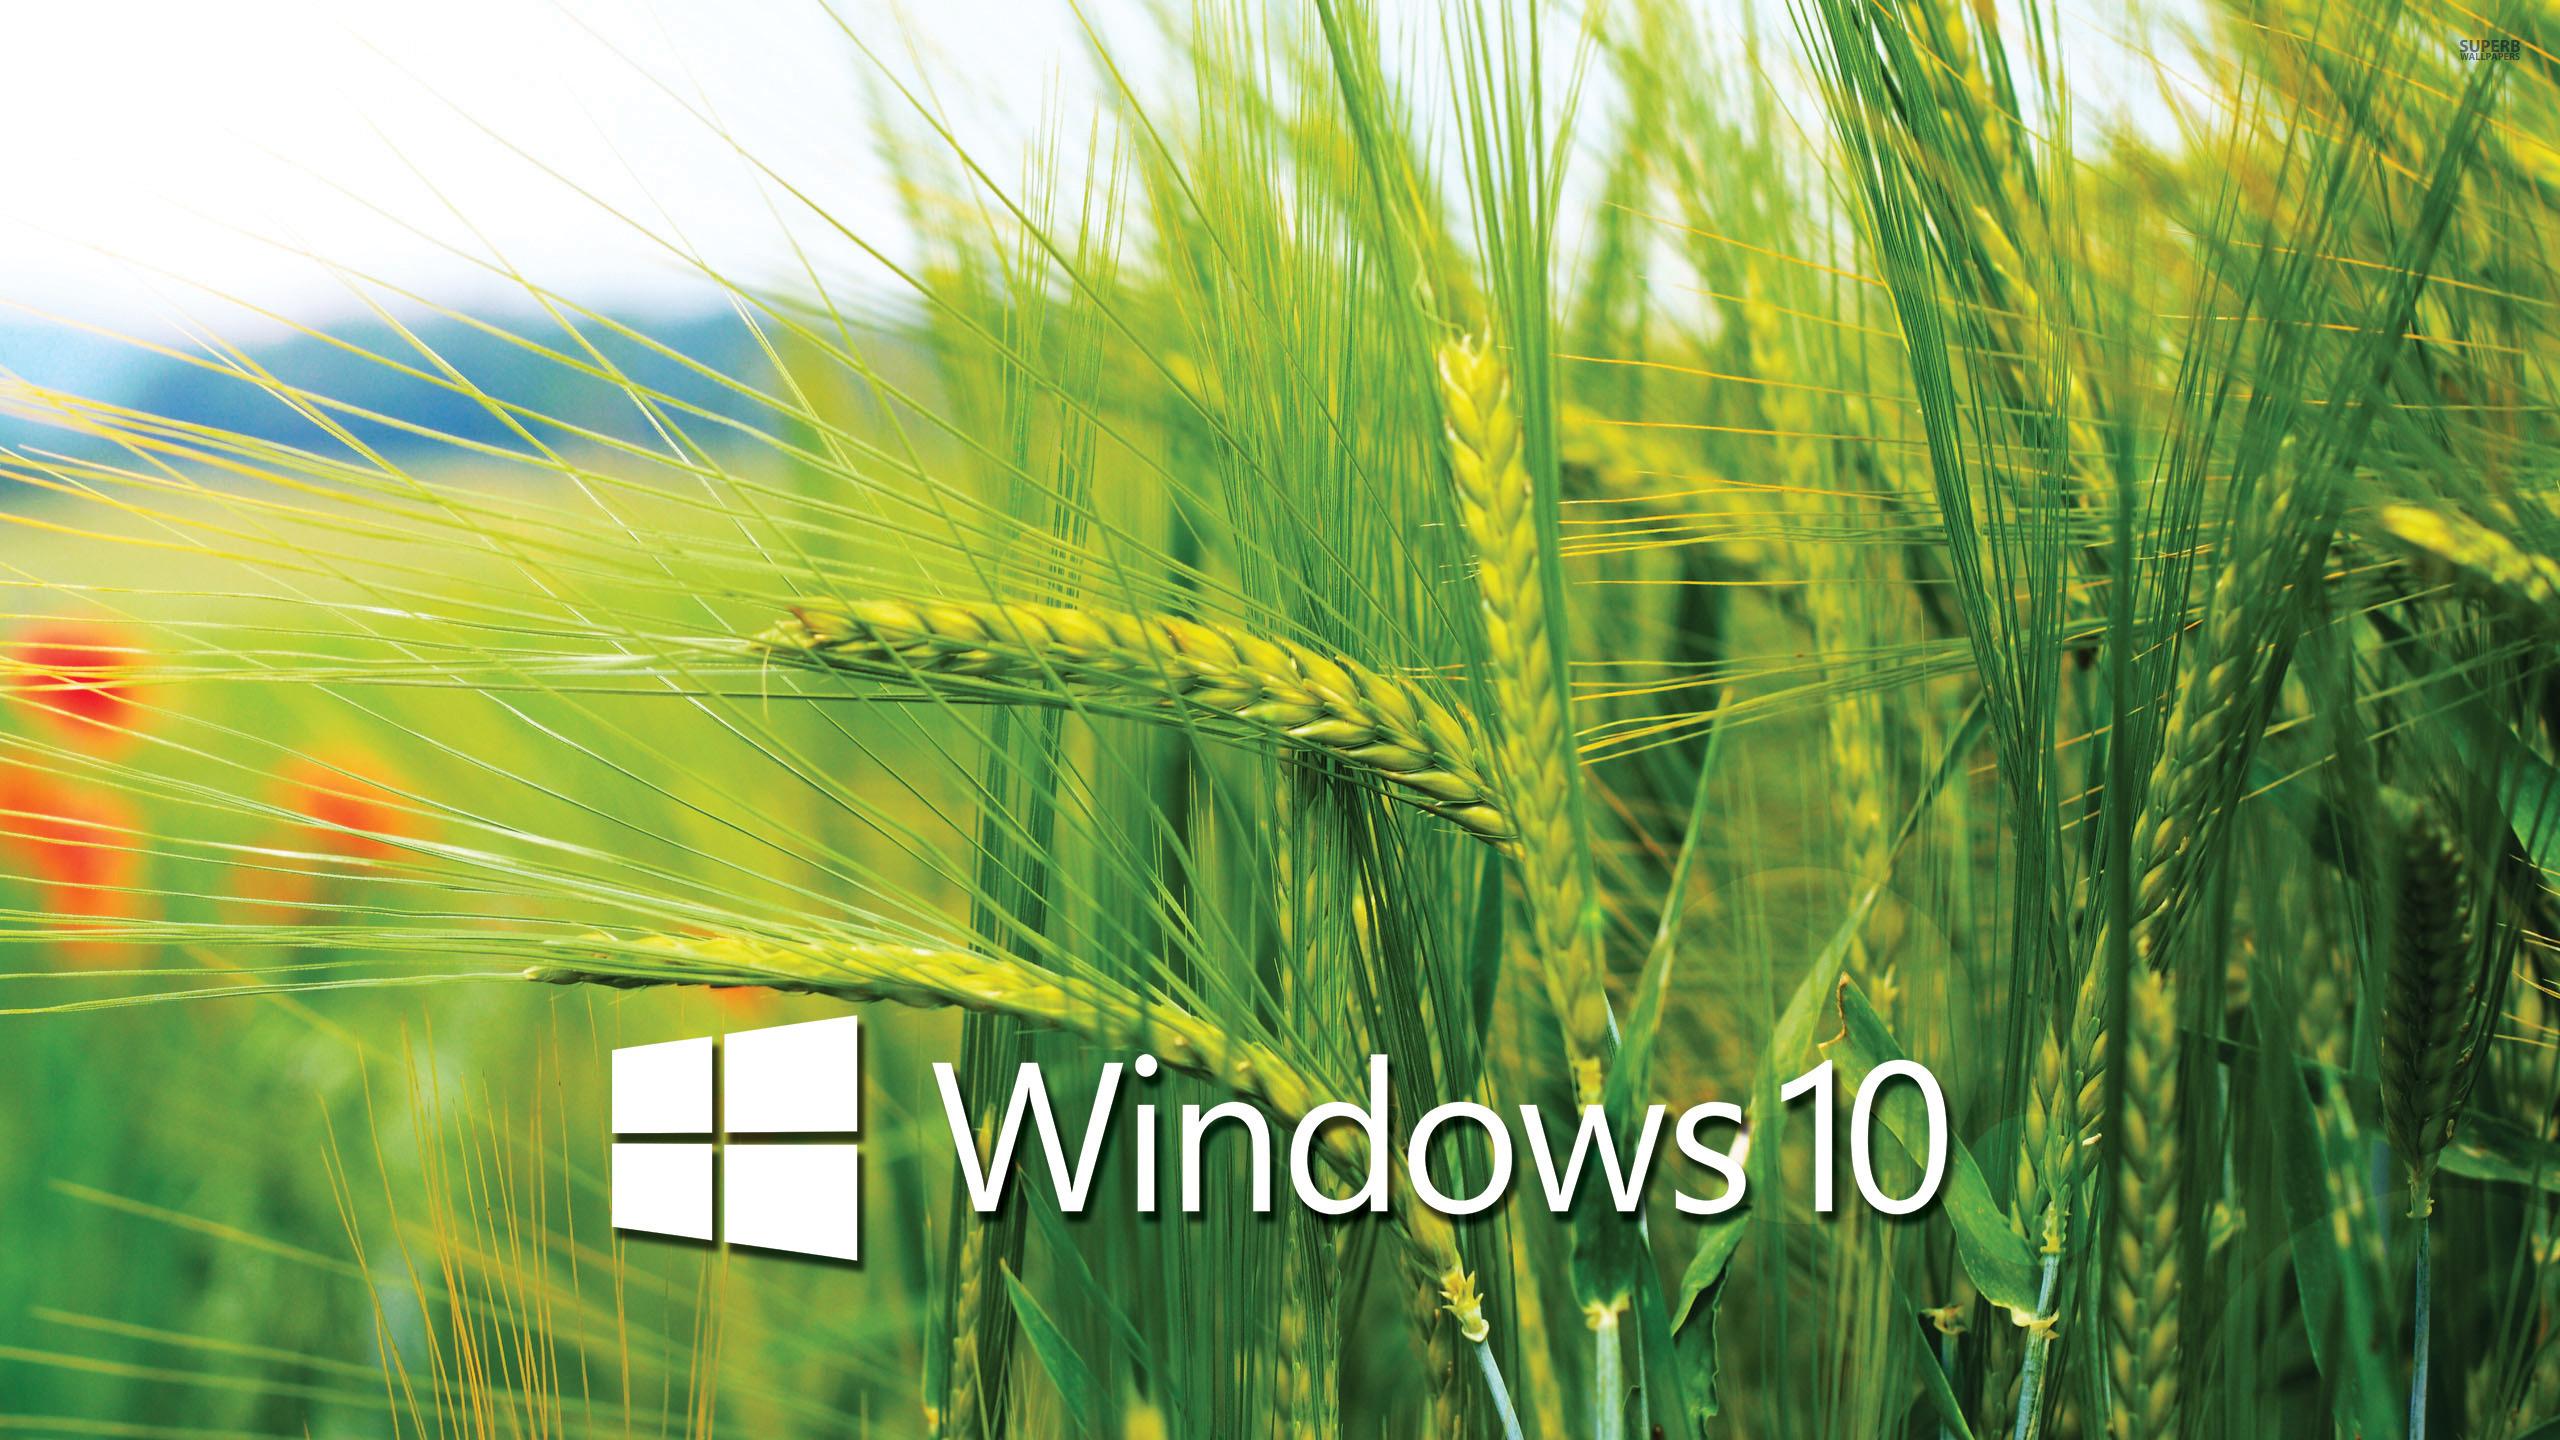 Windows-10-HD-Wallpaper-9